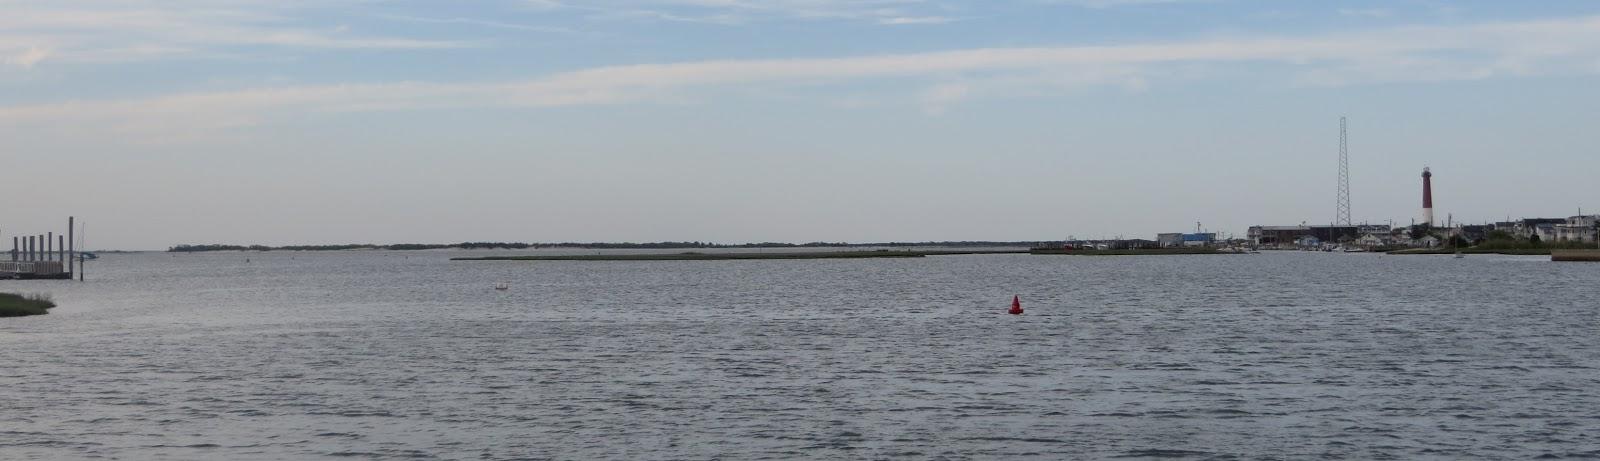 Mv help me rhonda finally out of cape may to barnegat bay for Barnegat bay fishing